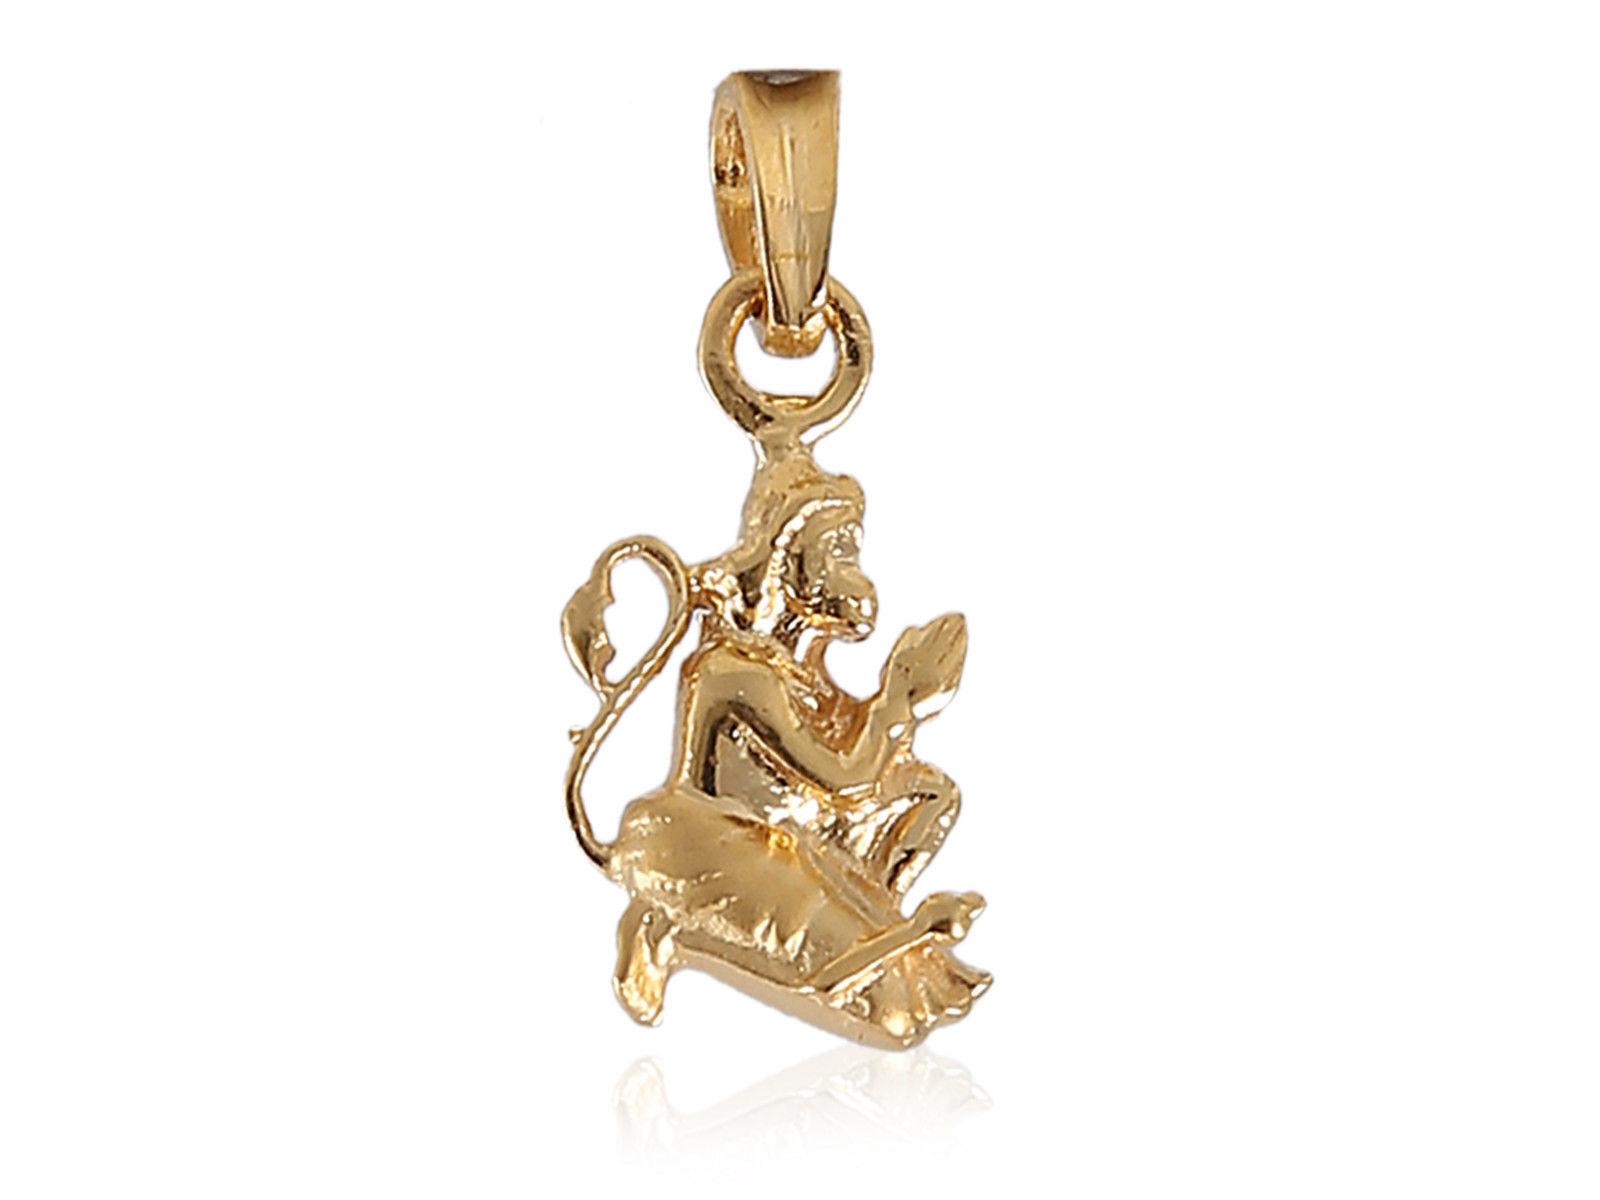 Vintage Handmade Unisex Hanuman Pendant In Solid Certified 22Karat Yellow gold